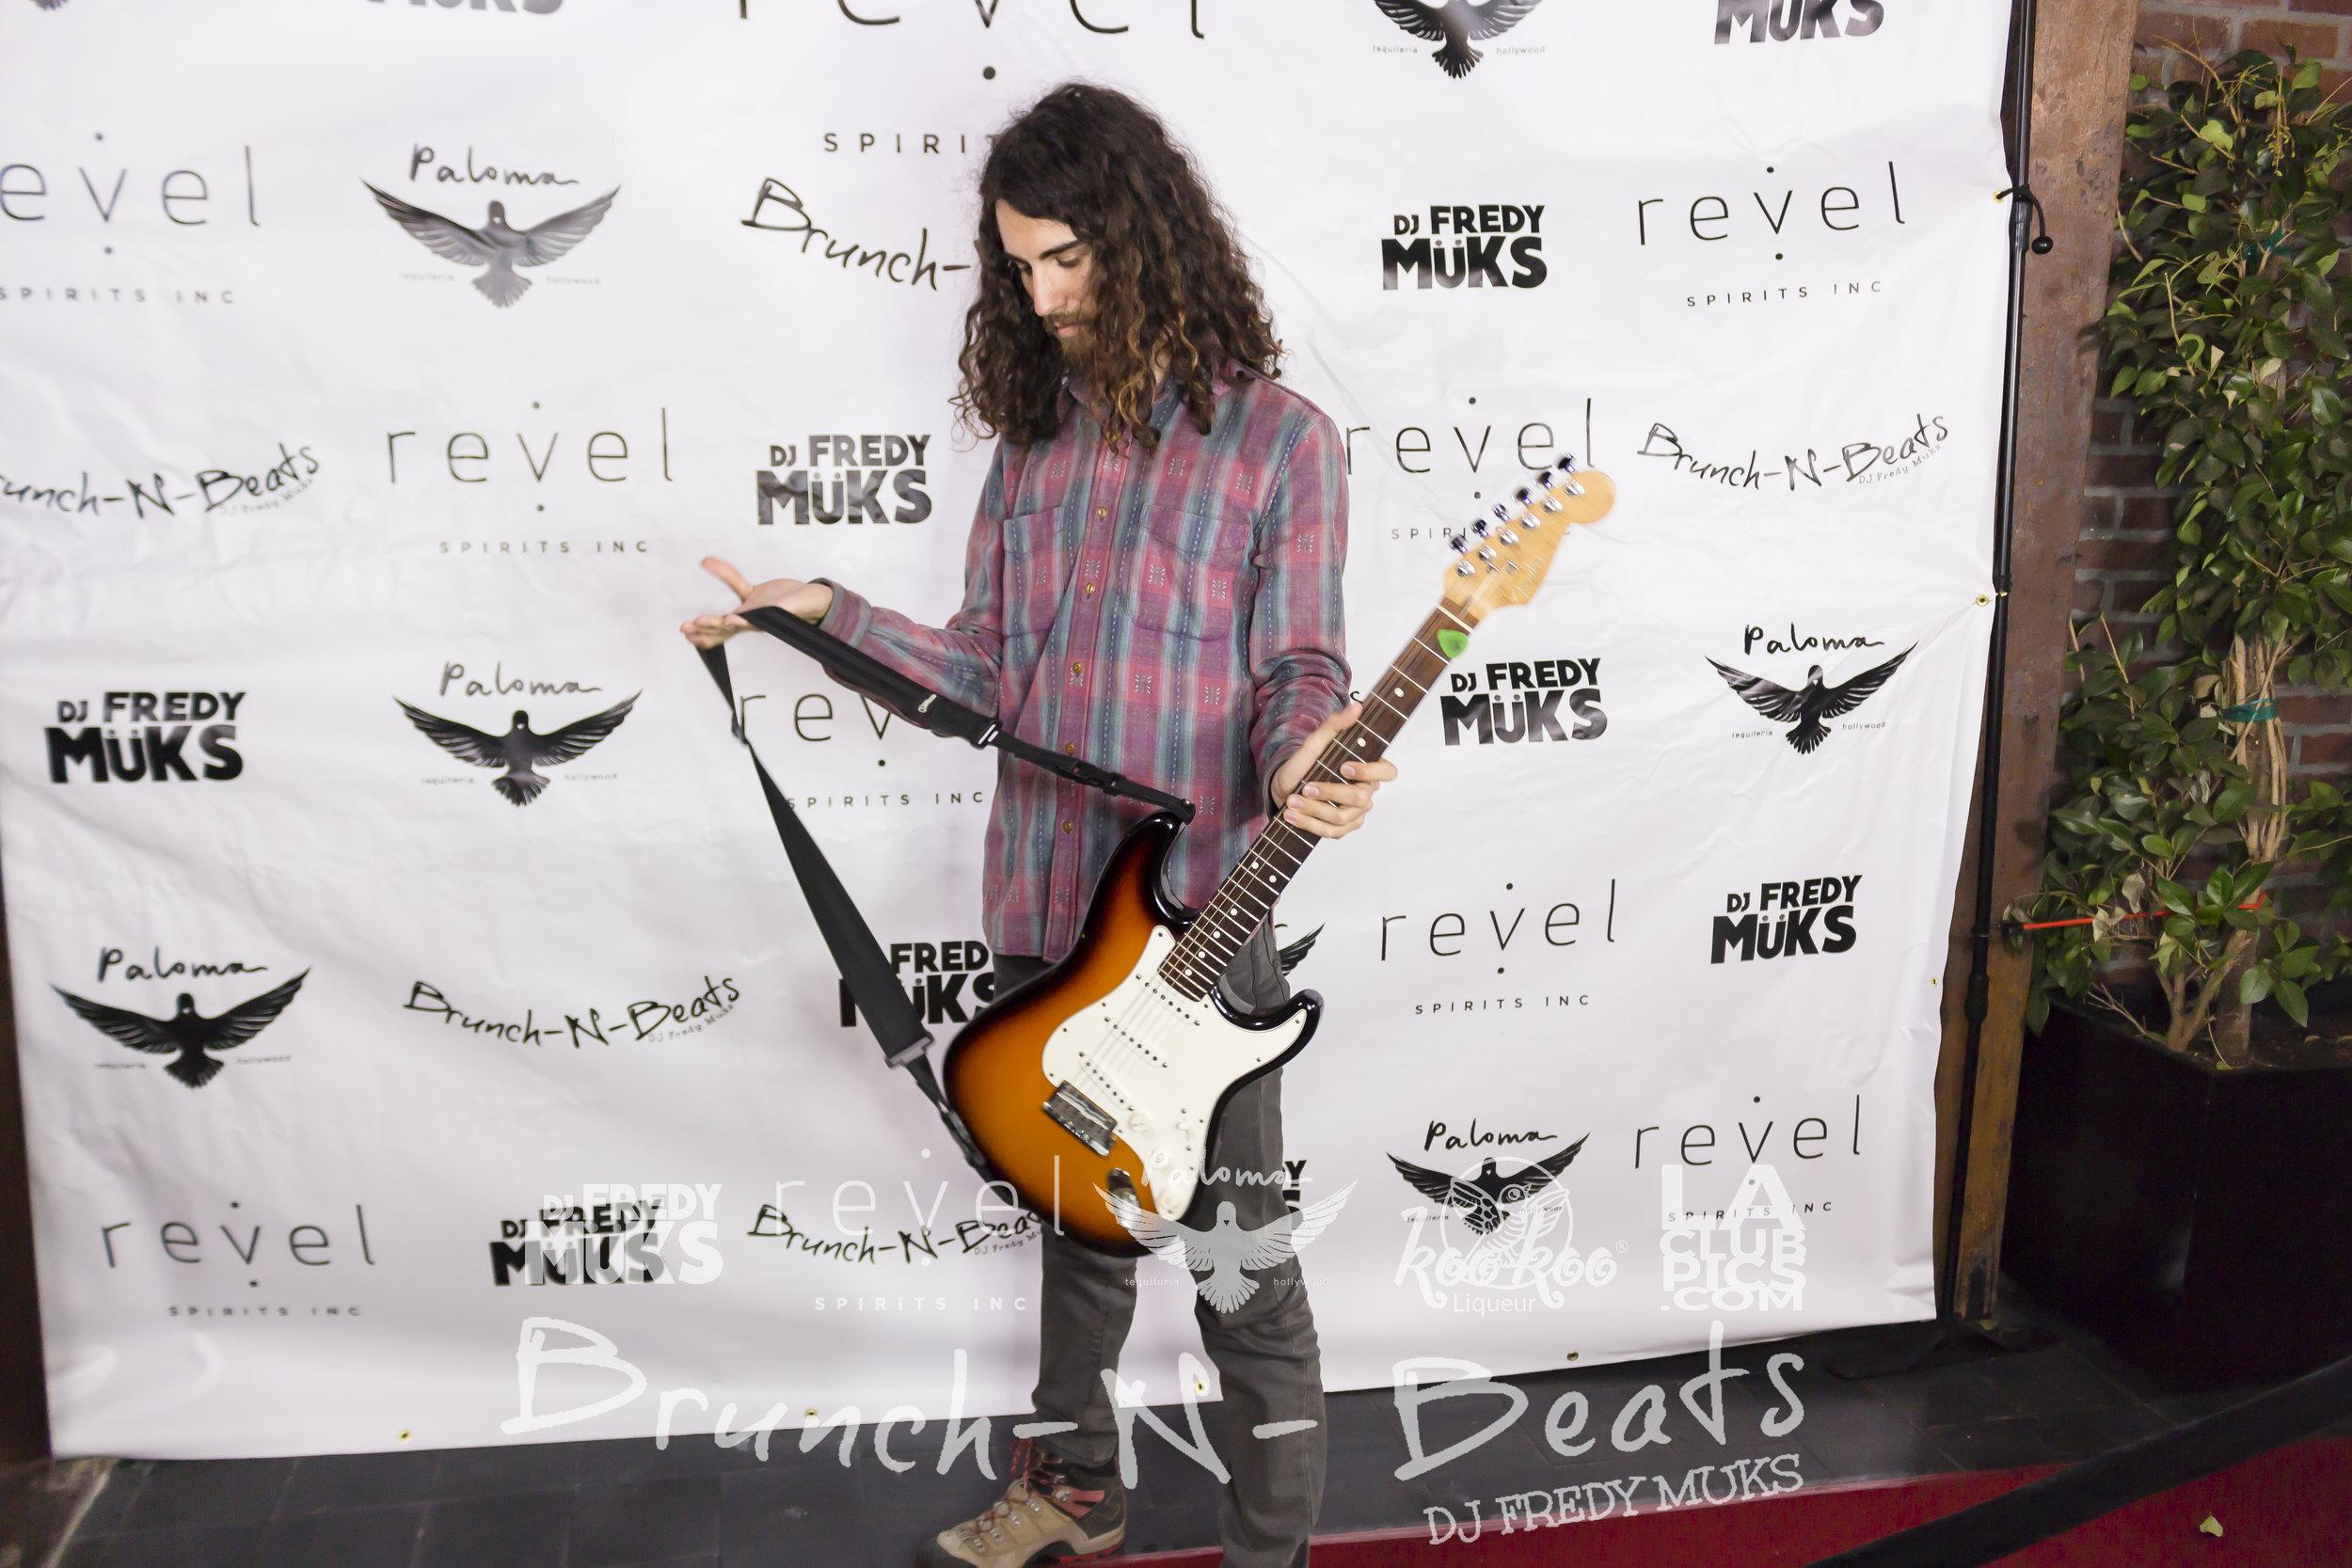 Brunch-N-Beats - 03-11-18_211.jpg